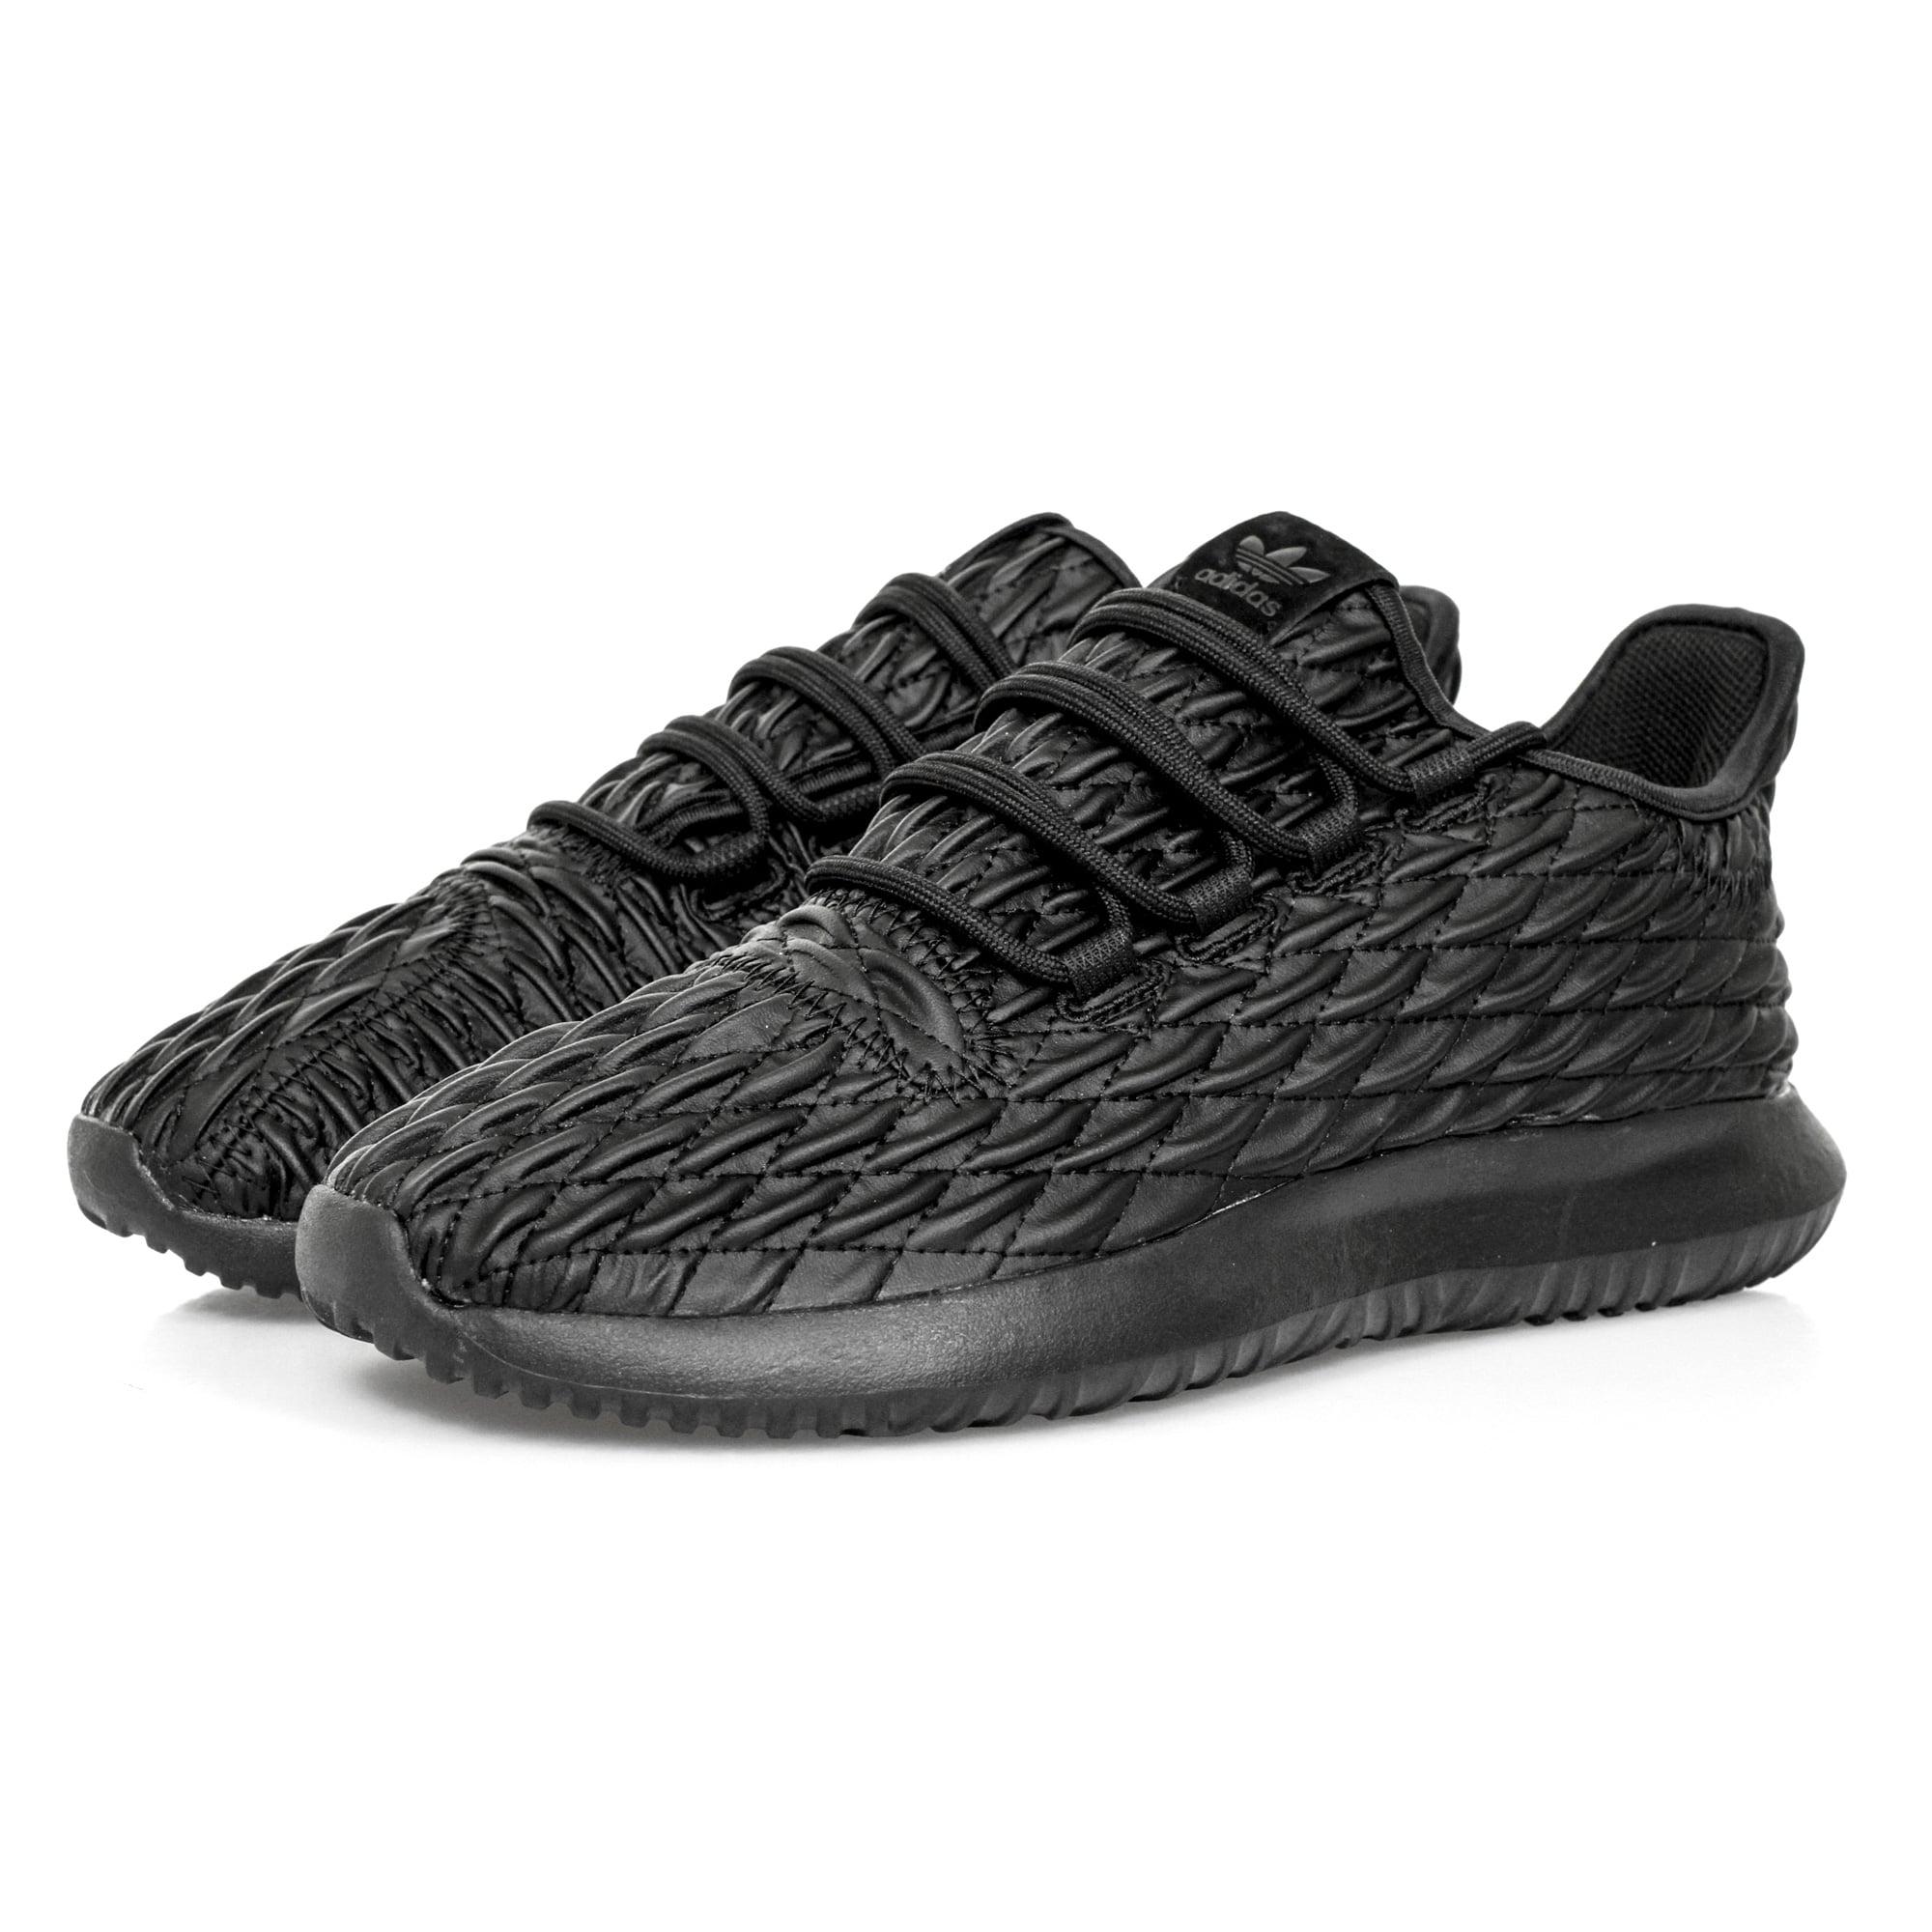 Adidas Ombra Tubolare Scarpe Nere wmb0j